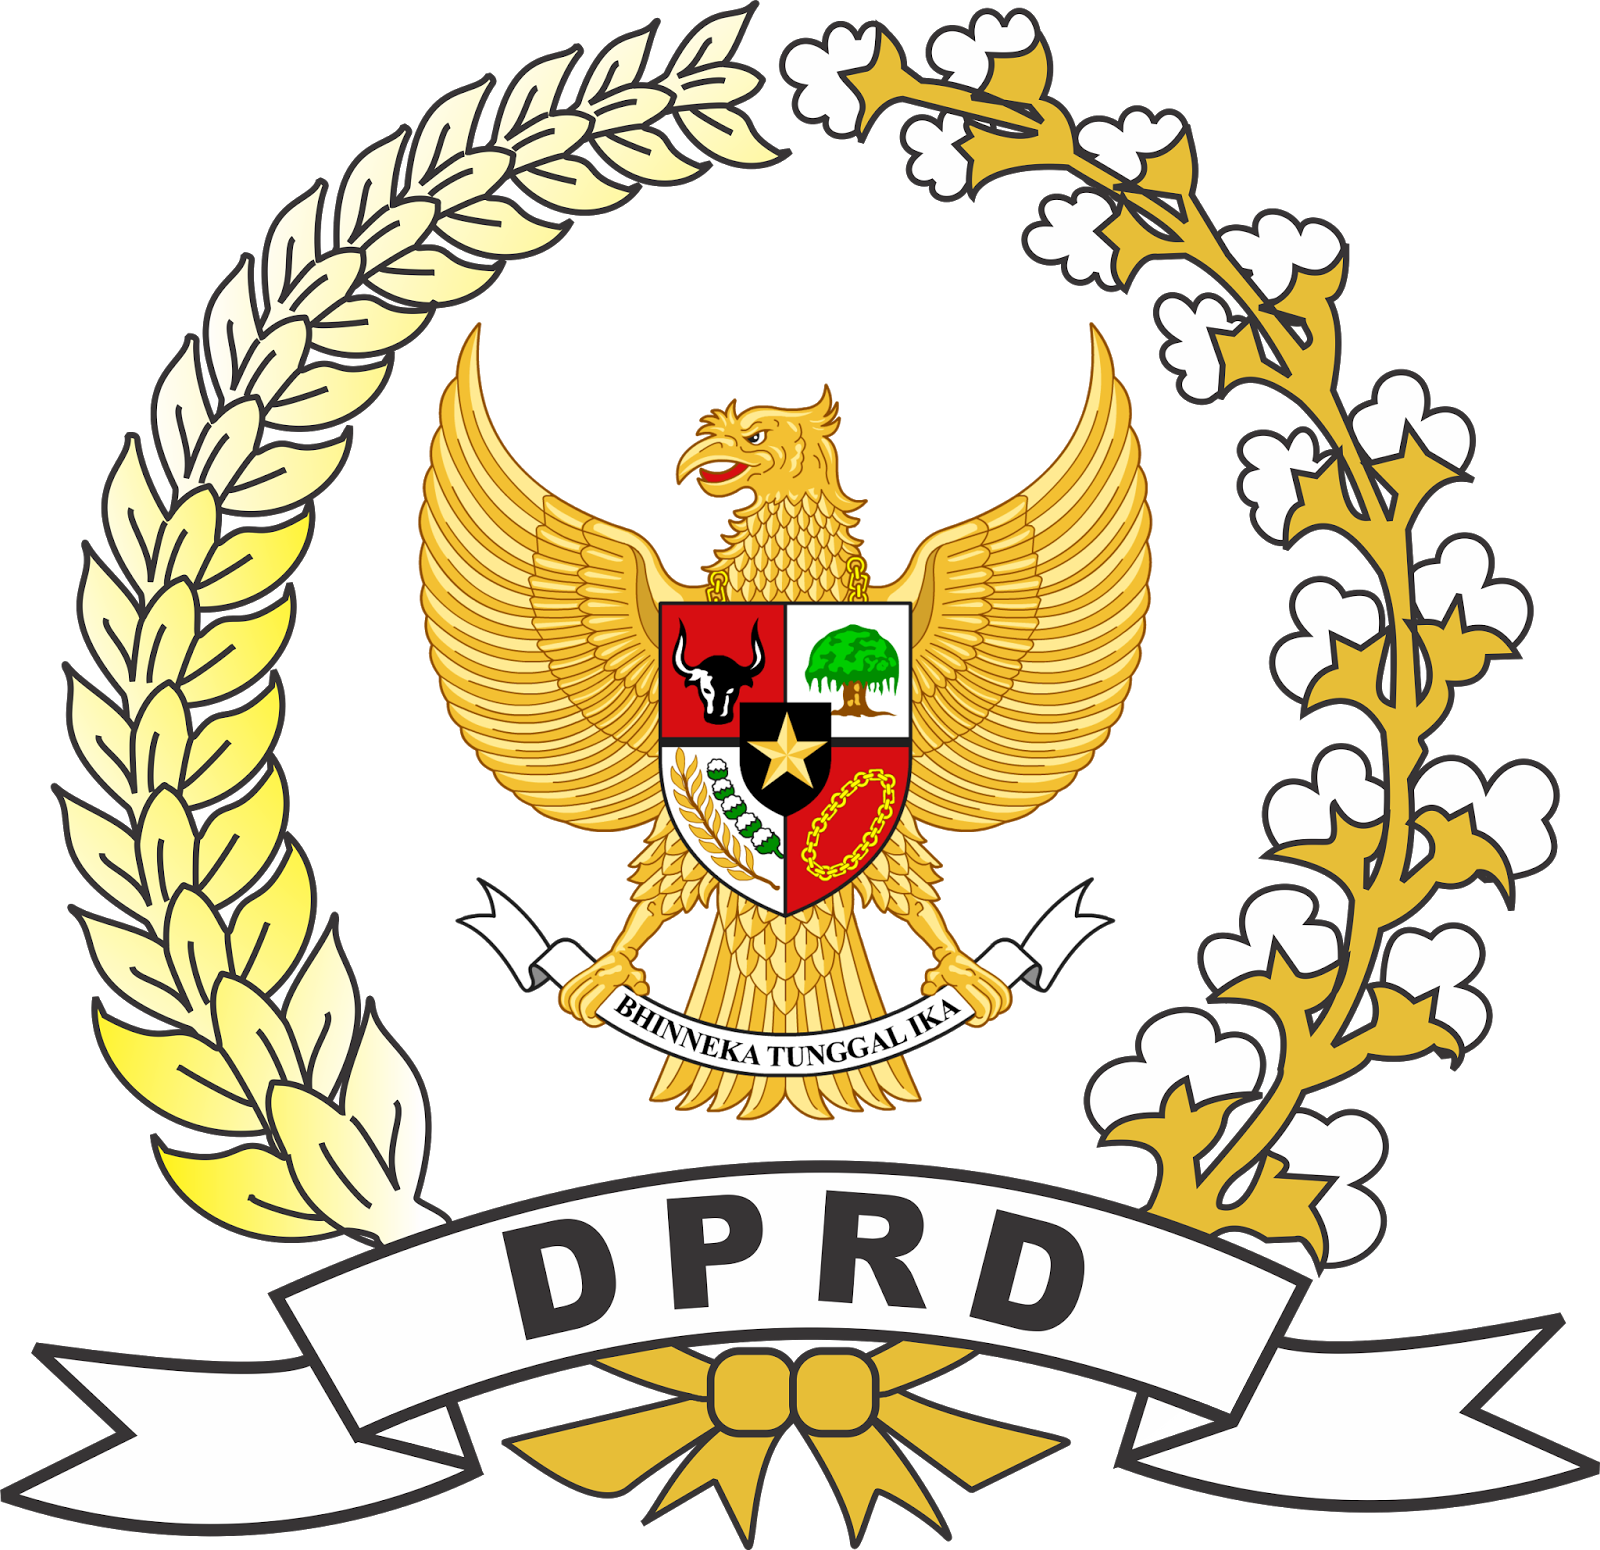 Logo DPR RI dan DPRD High Quality Vector